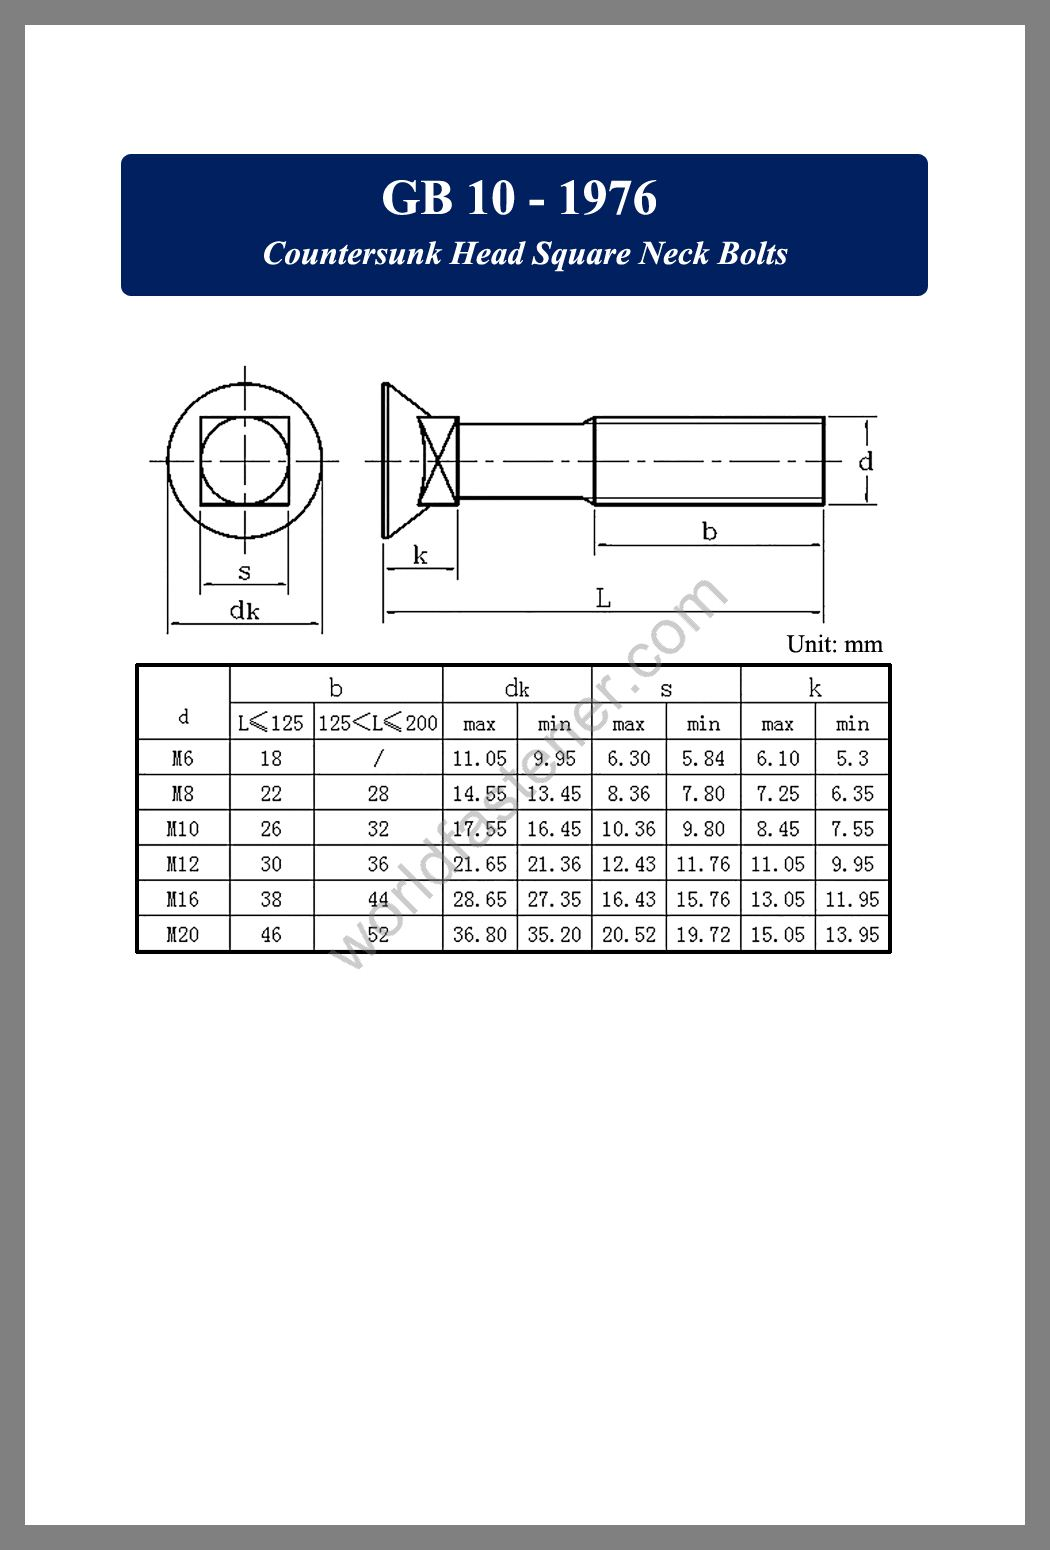 GB 10 Countersunk Head Square Neck Bolts, Countersunk Head Bolts, Countersunk Head Screws, fastener, screw, bolt, GB bolts, GB Fasteners